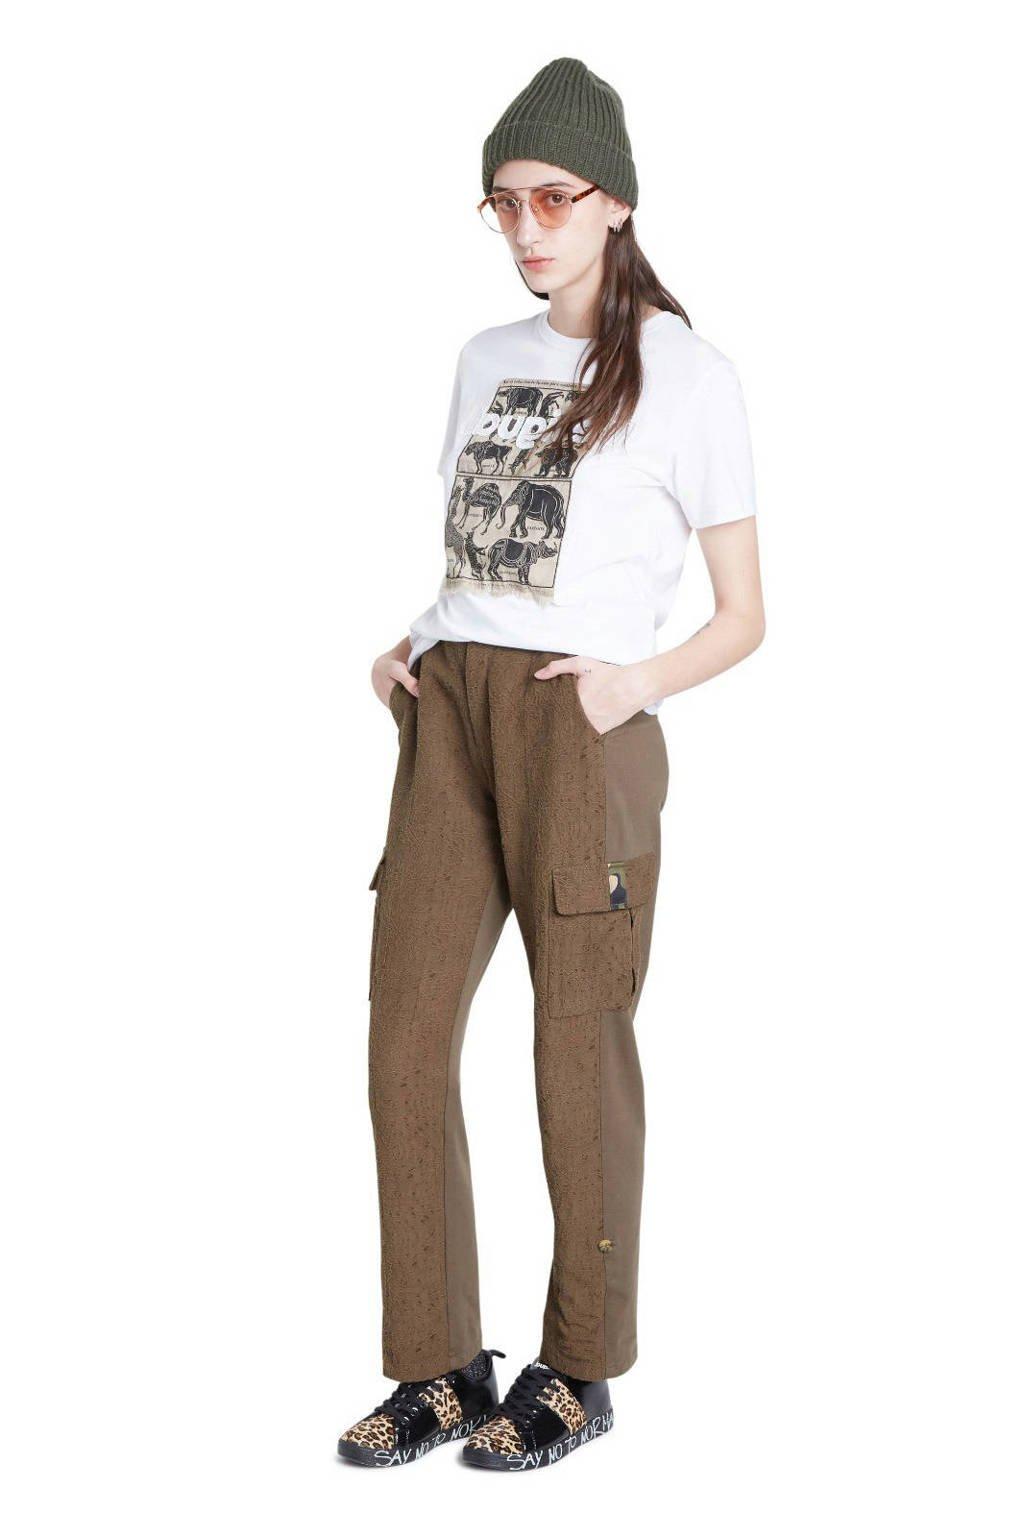 Desigual T-shirt met printopdruk en pailletten wit/bruin/zwart, Wit/bruin/zwart